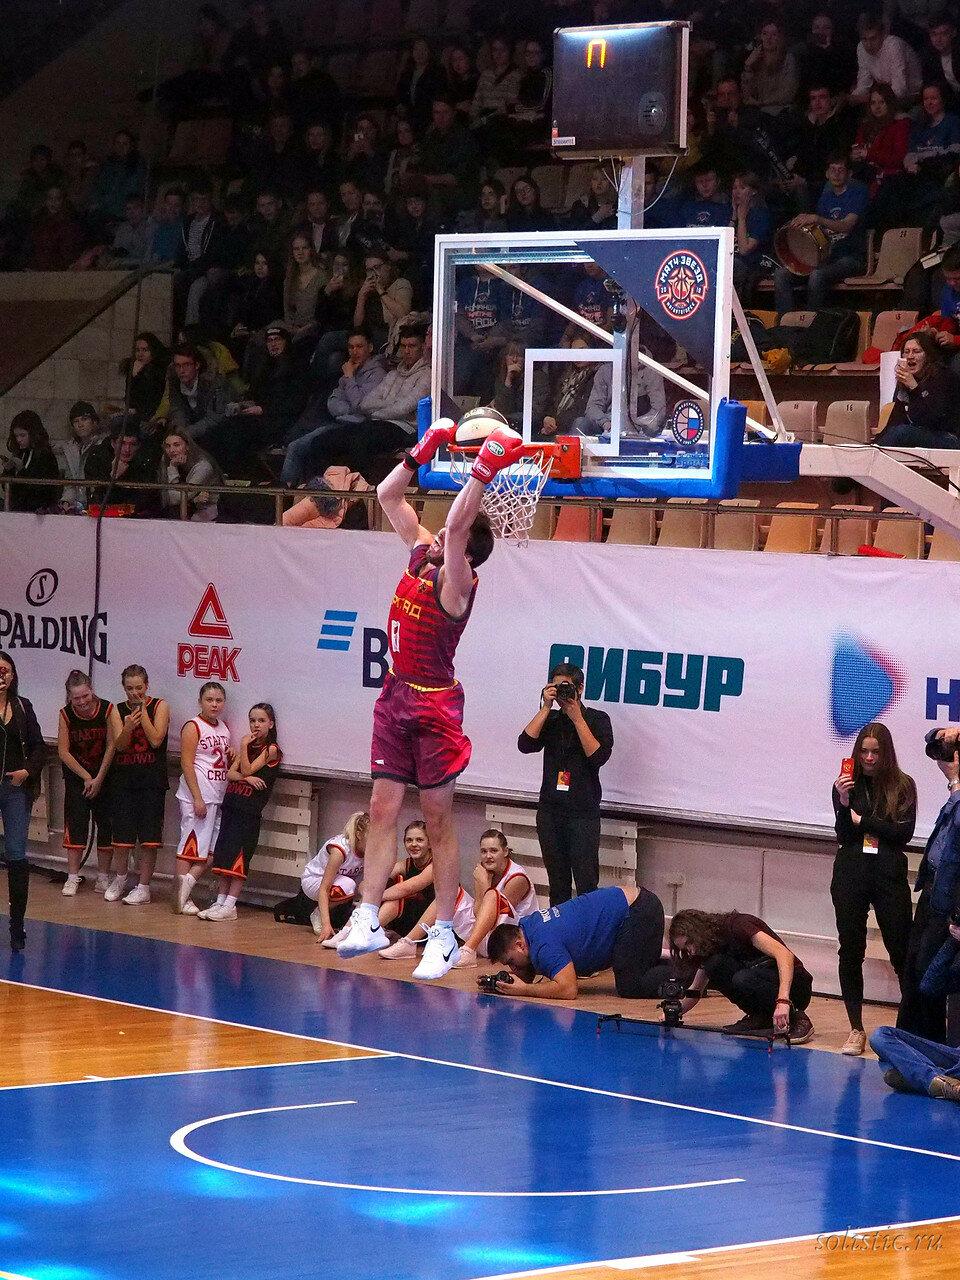 122 Матч звезд АСБ 2018 (ассоциации студенческого баскетбола)